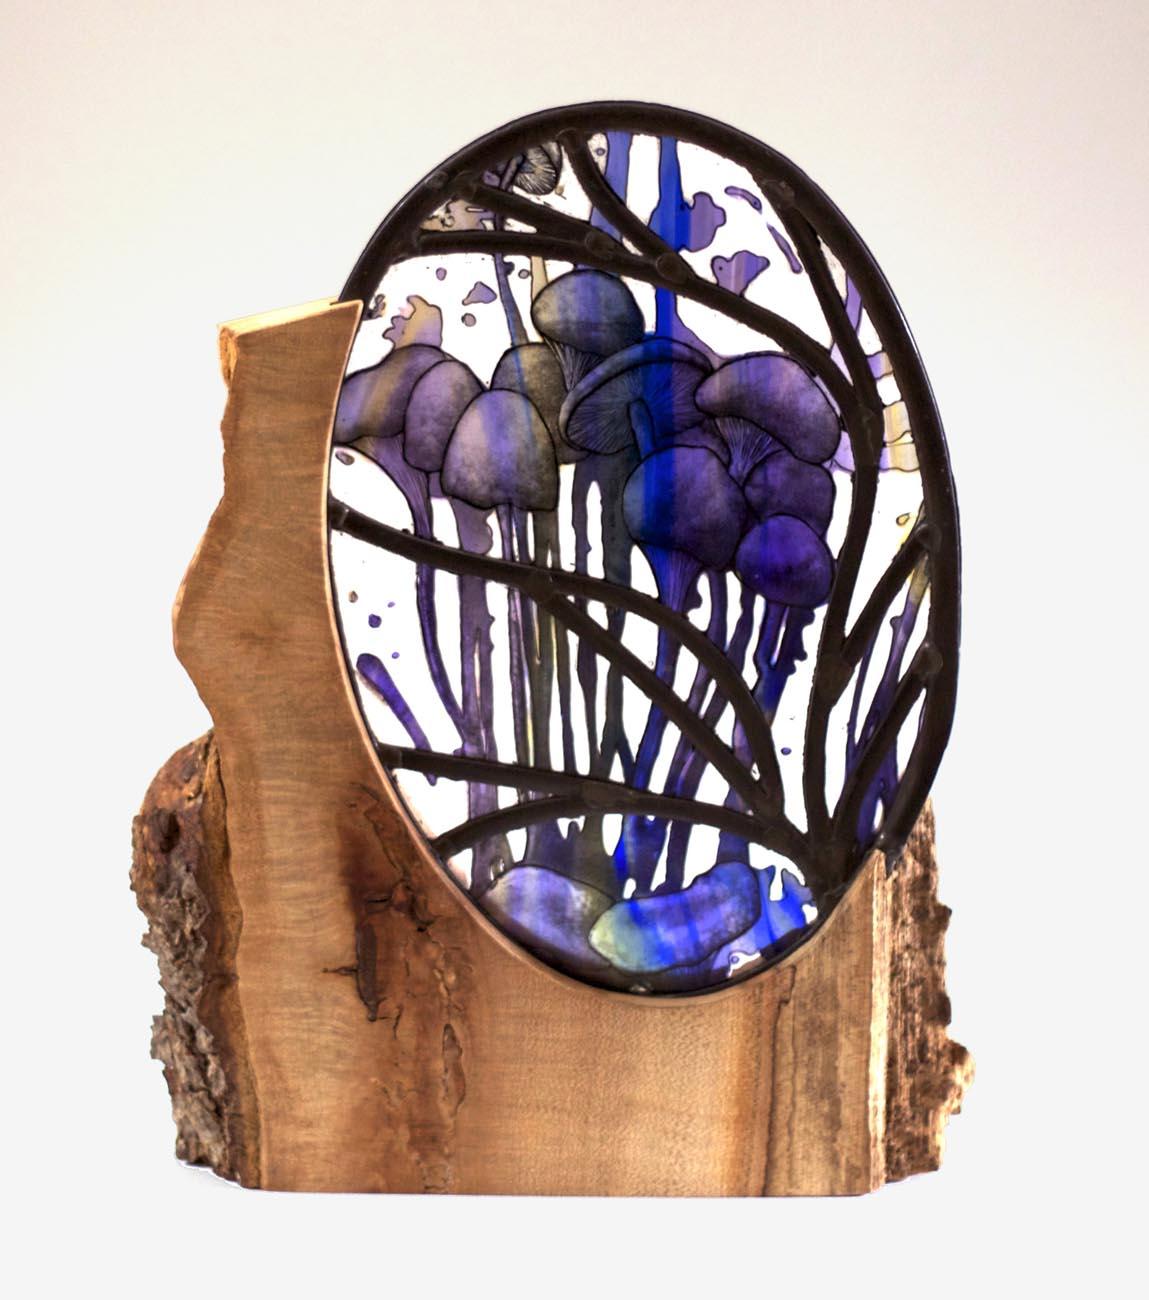 Fungistainedglass